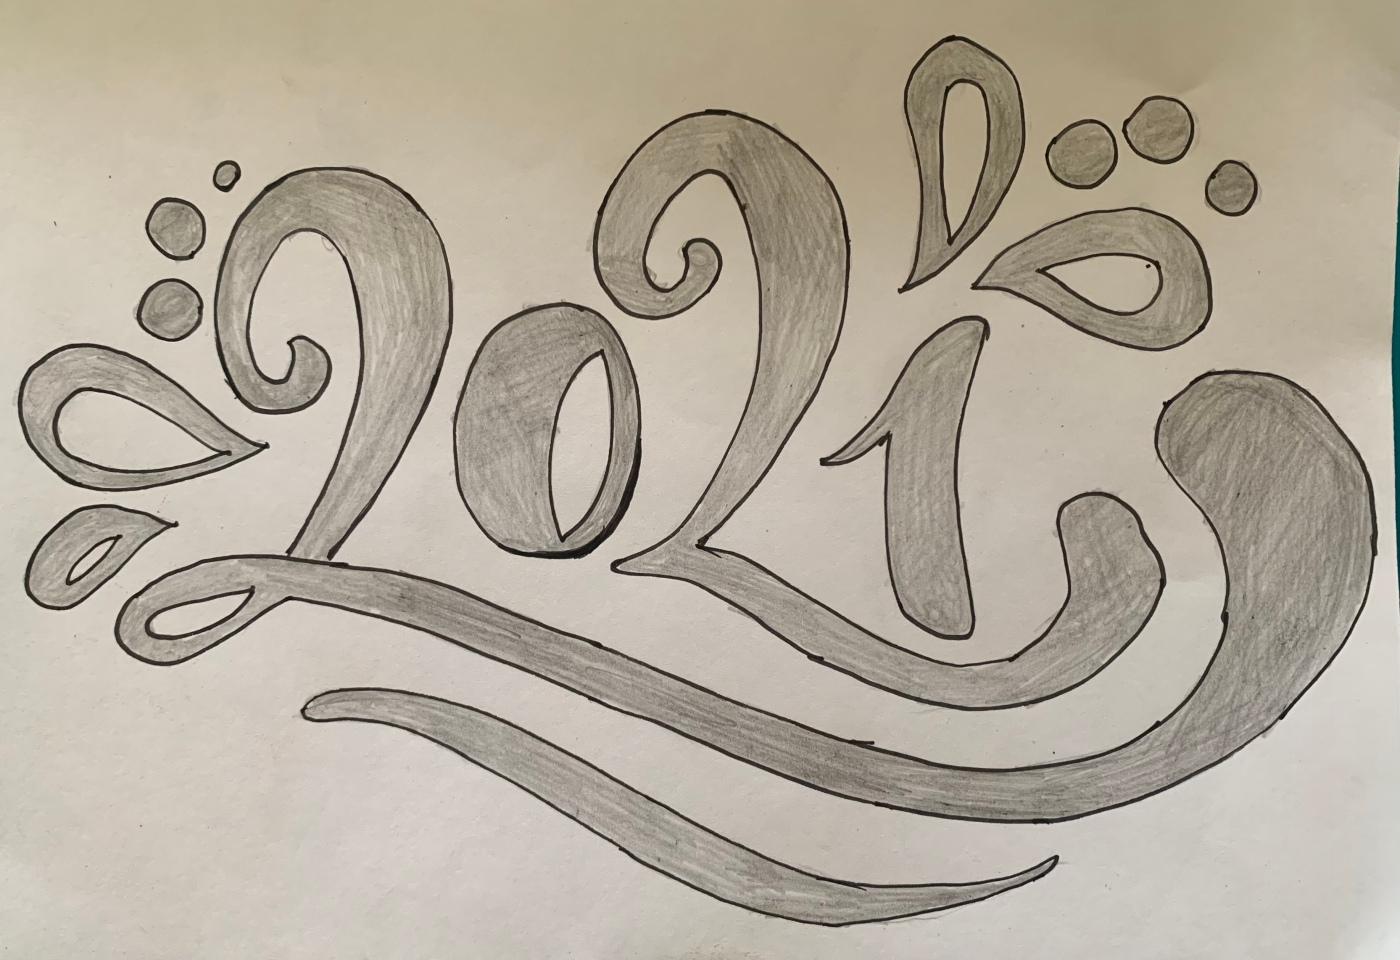 2020-21!